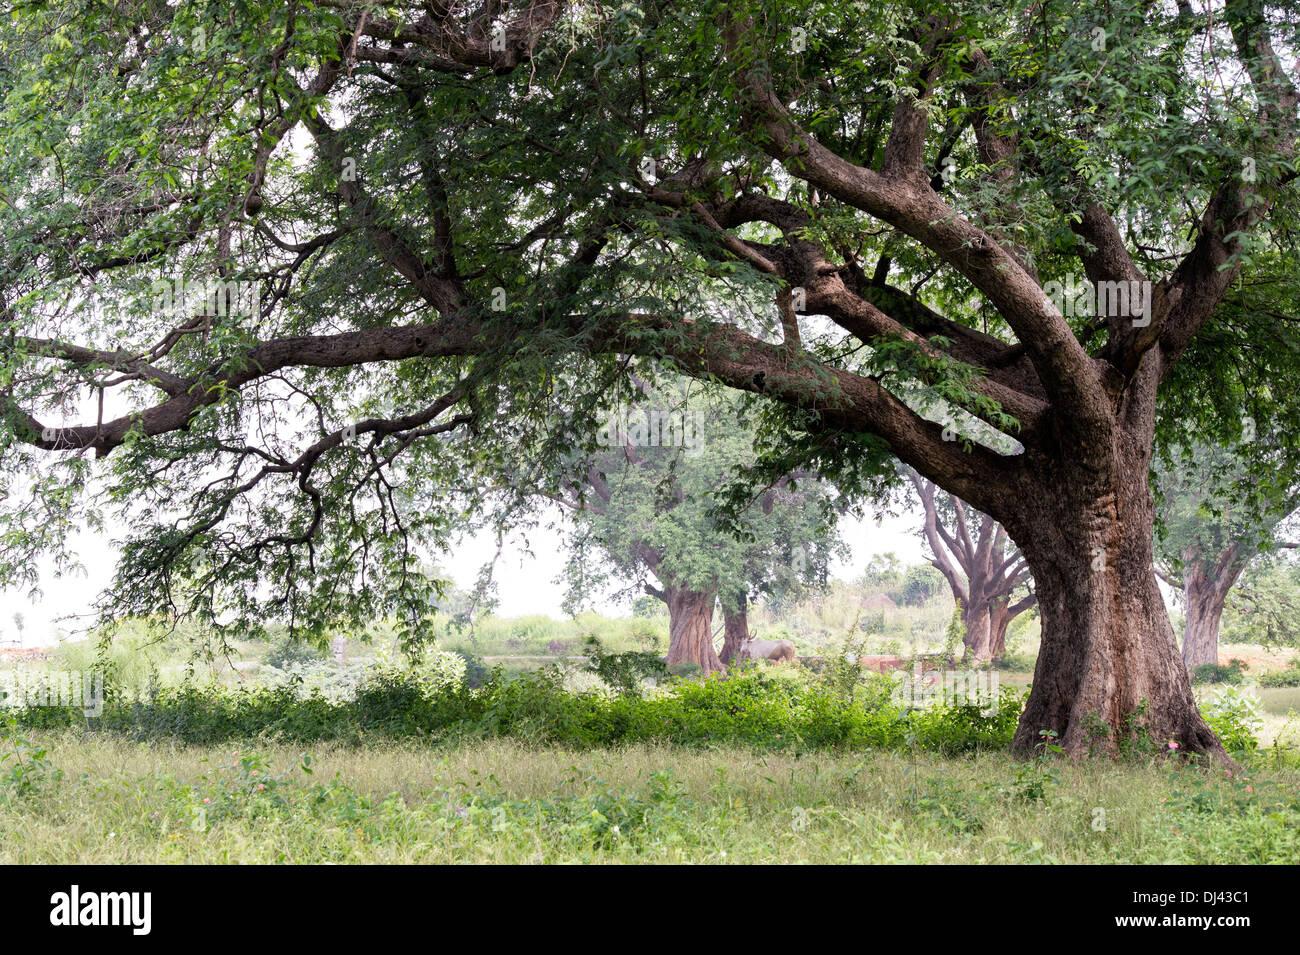 tamarindus indica . tamarind tree trunk in the indian countryside, Beautiful flower